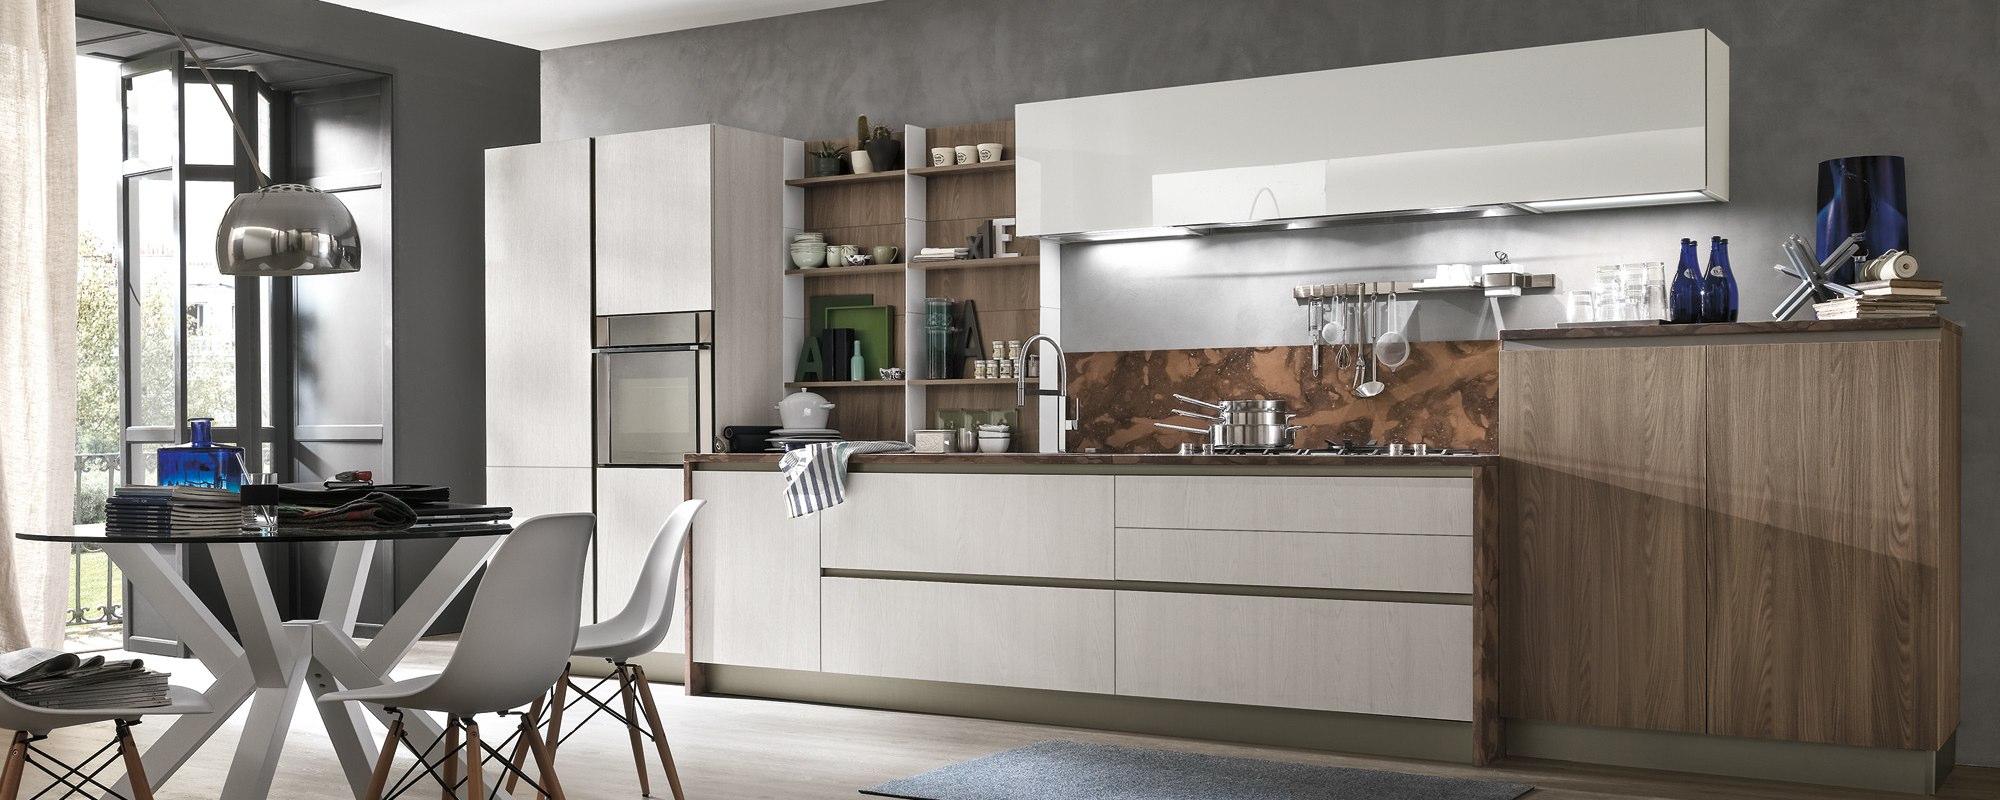 Cucine moderne perfect cucine scavolini moderne le for Pm arredamenti cagliari